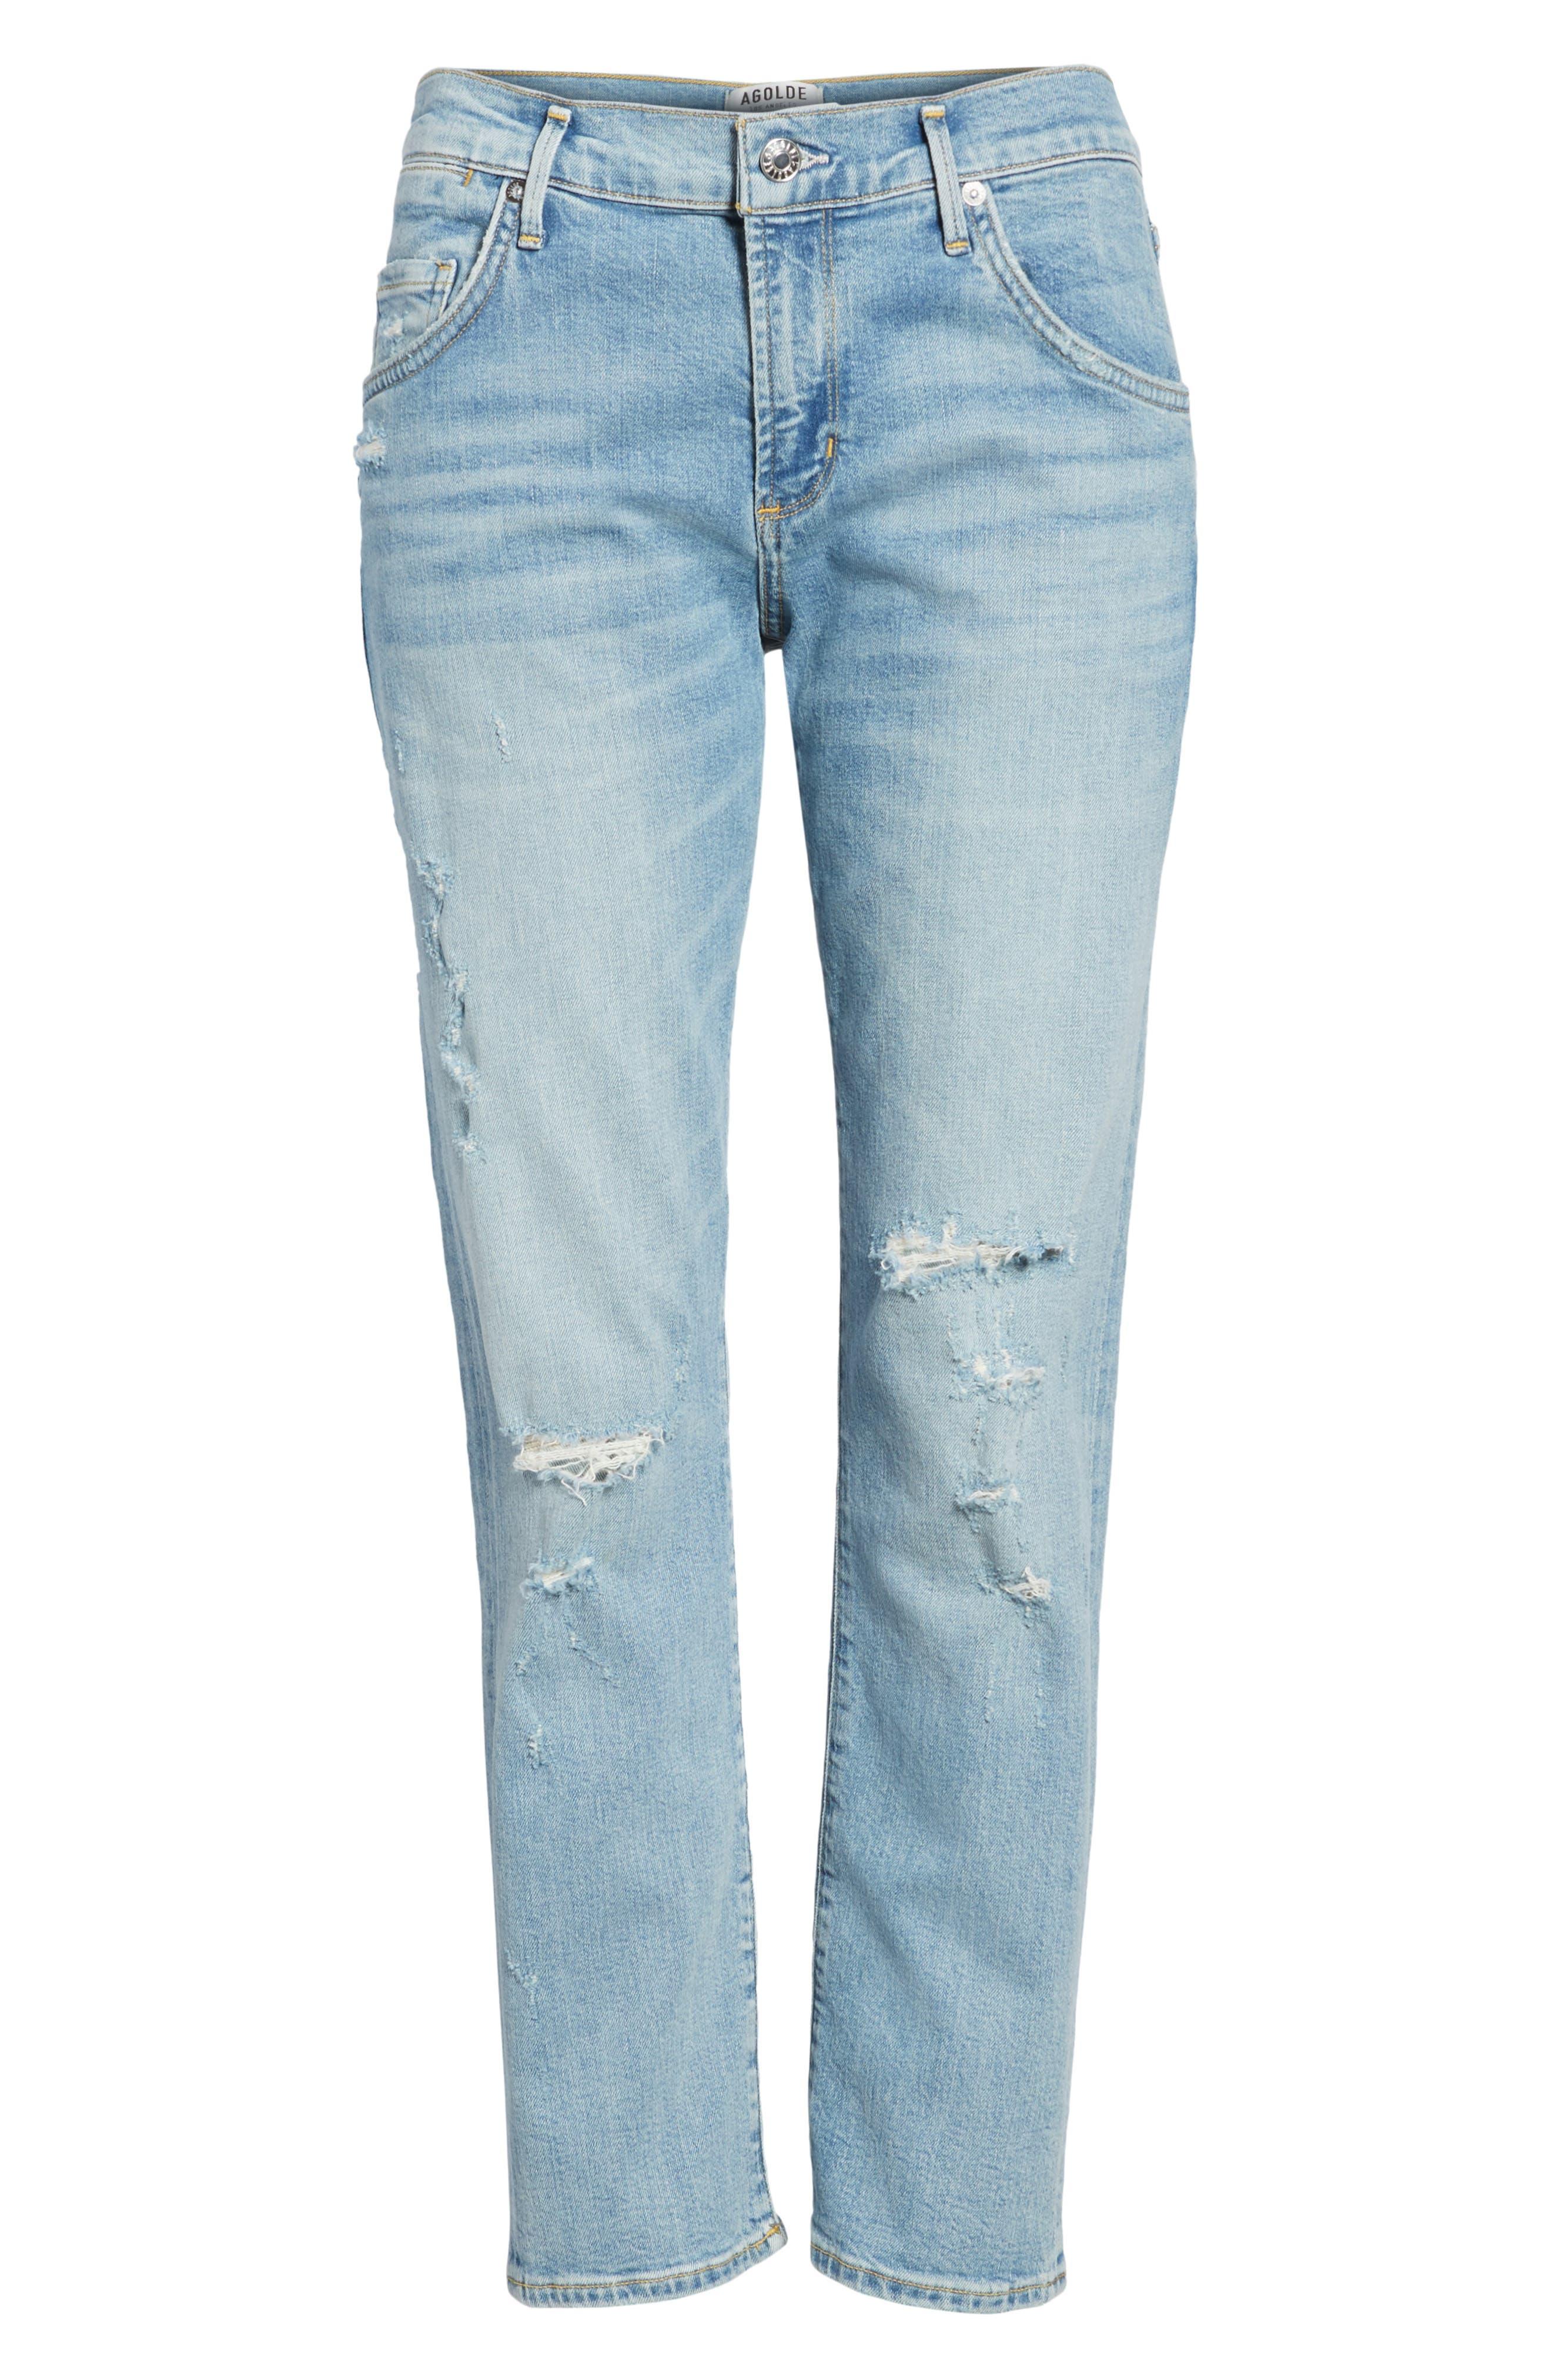 Isabel Ankle Slim Boyfriend Jeans,                             Alternate thumbnail 7, color,                             463